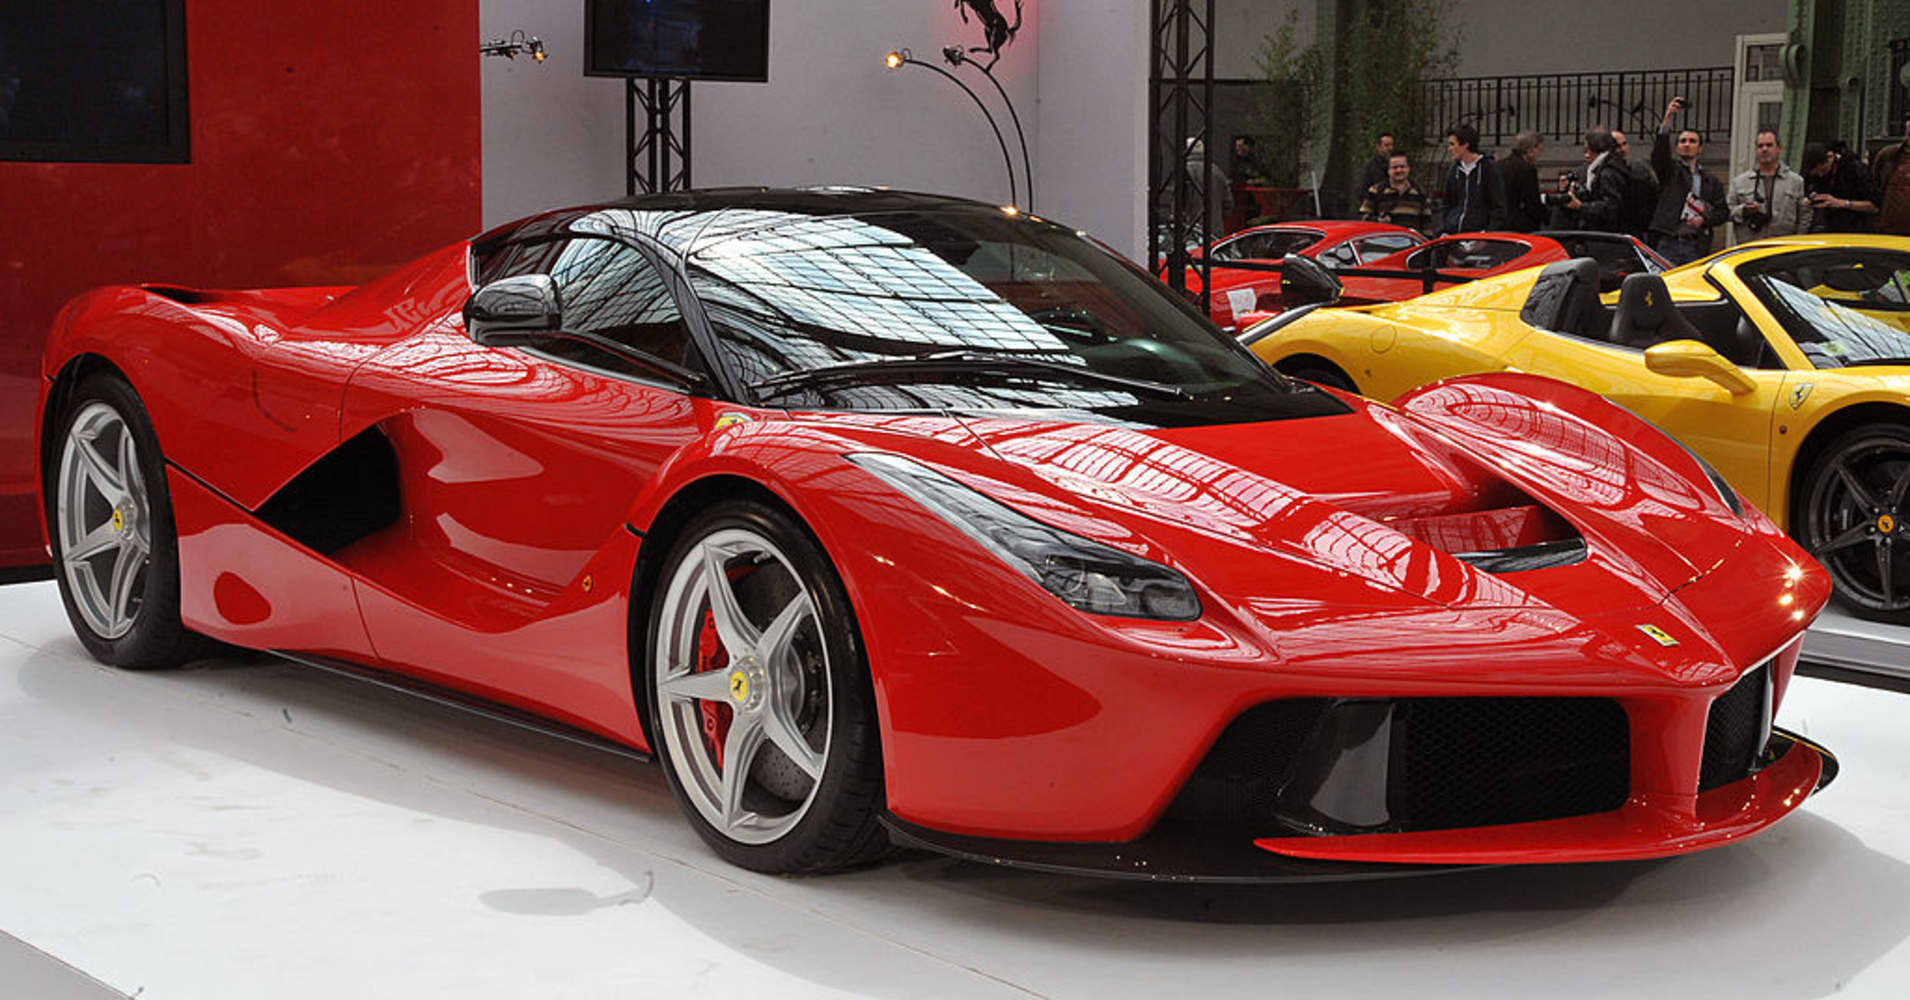 The 'LaFerrari' car build by Italian car maker Ferrari is on display during its presentation on April 22, 2013 in Paris.